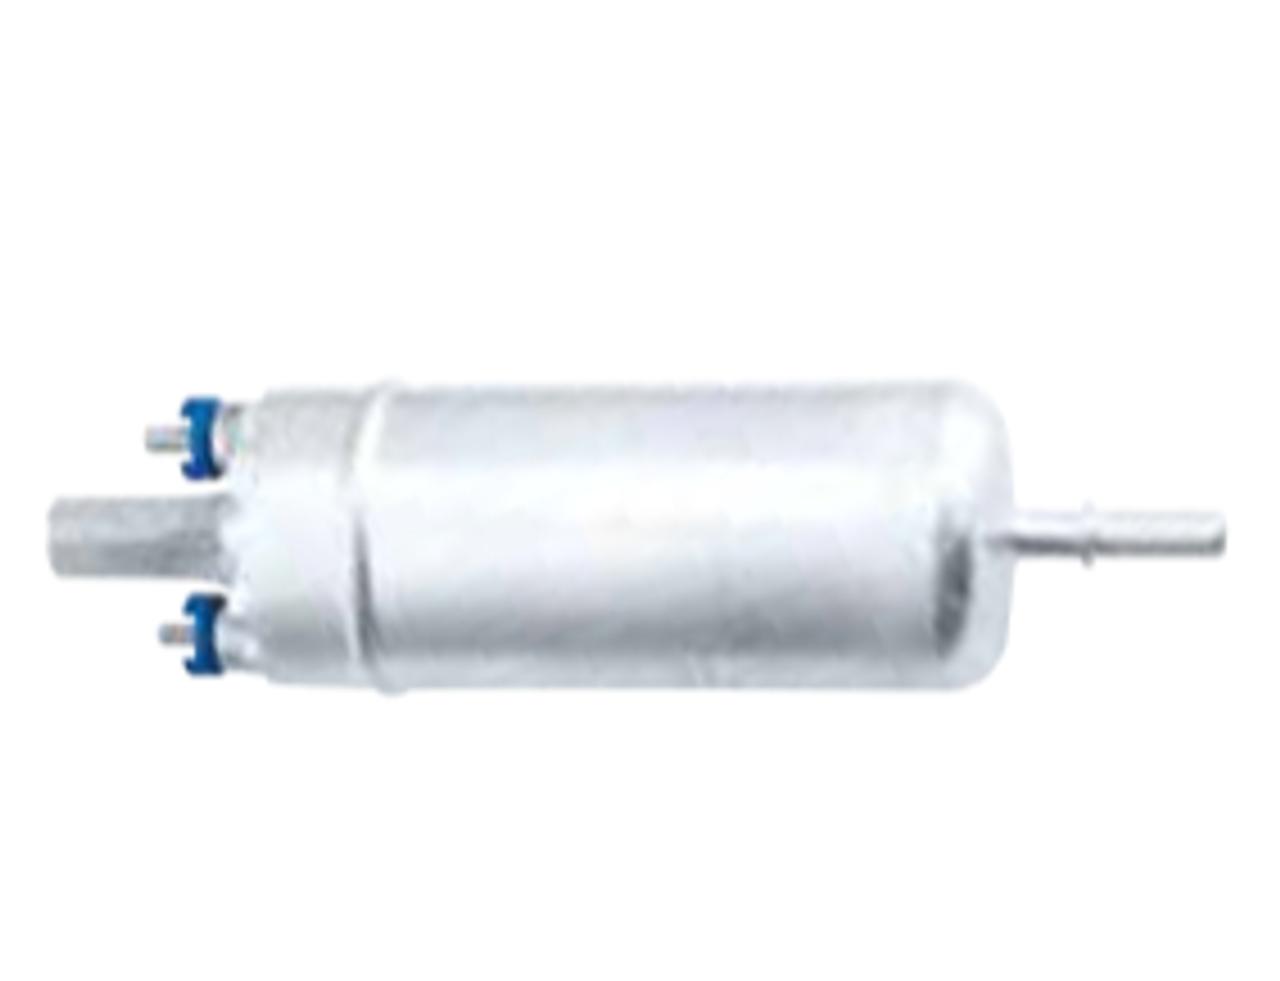 Racor Fuel Transfer Pump Ford Powerstroke 6.4L Diesel 08-10 F-Series